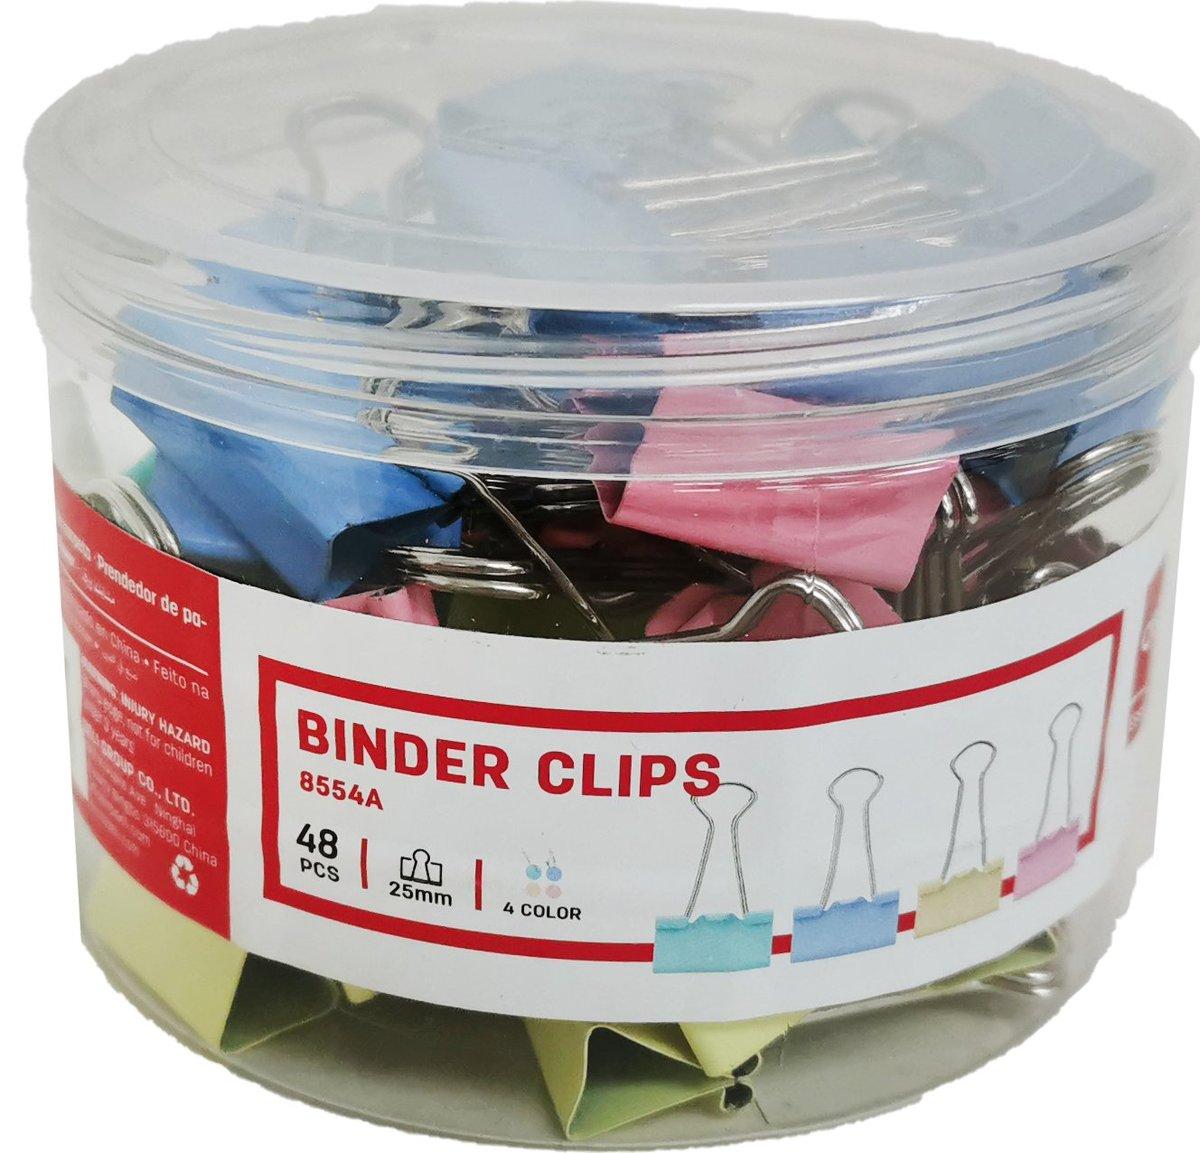 Colourful Binder Clips 8554A 25mm (48pcs/box)